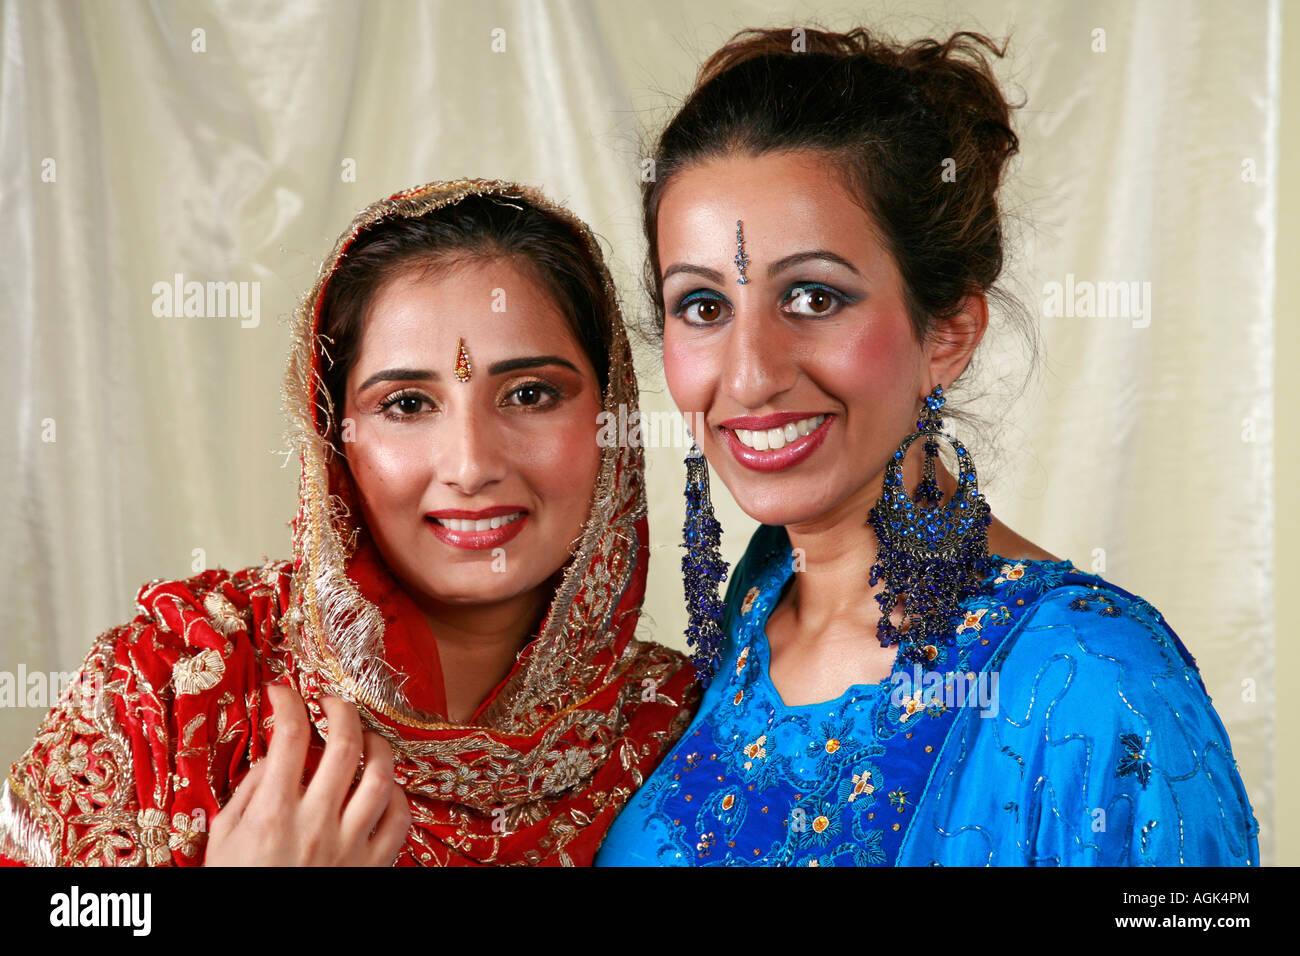 Asian Women In Traditional Indian Wedding Dresses With Jewellery Earrings Tikka And Bindi